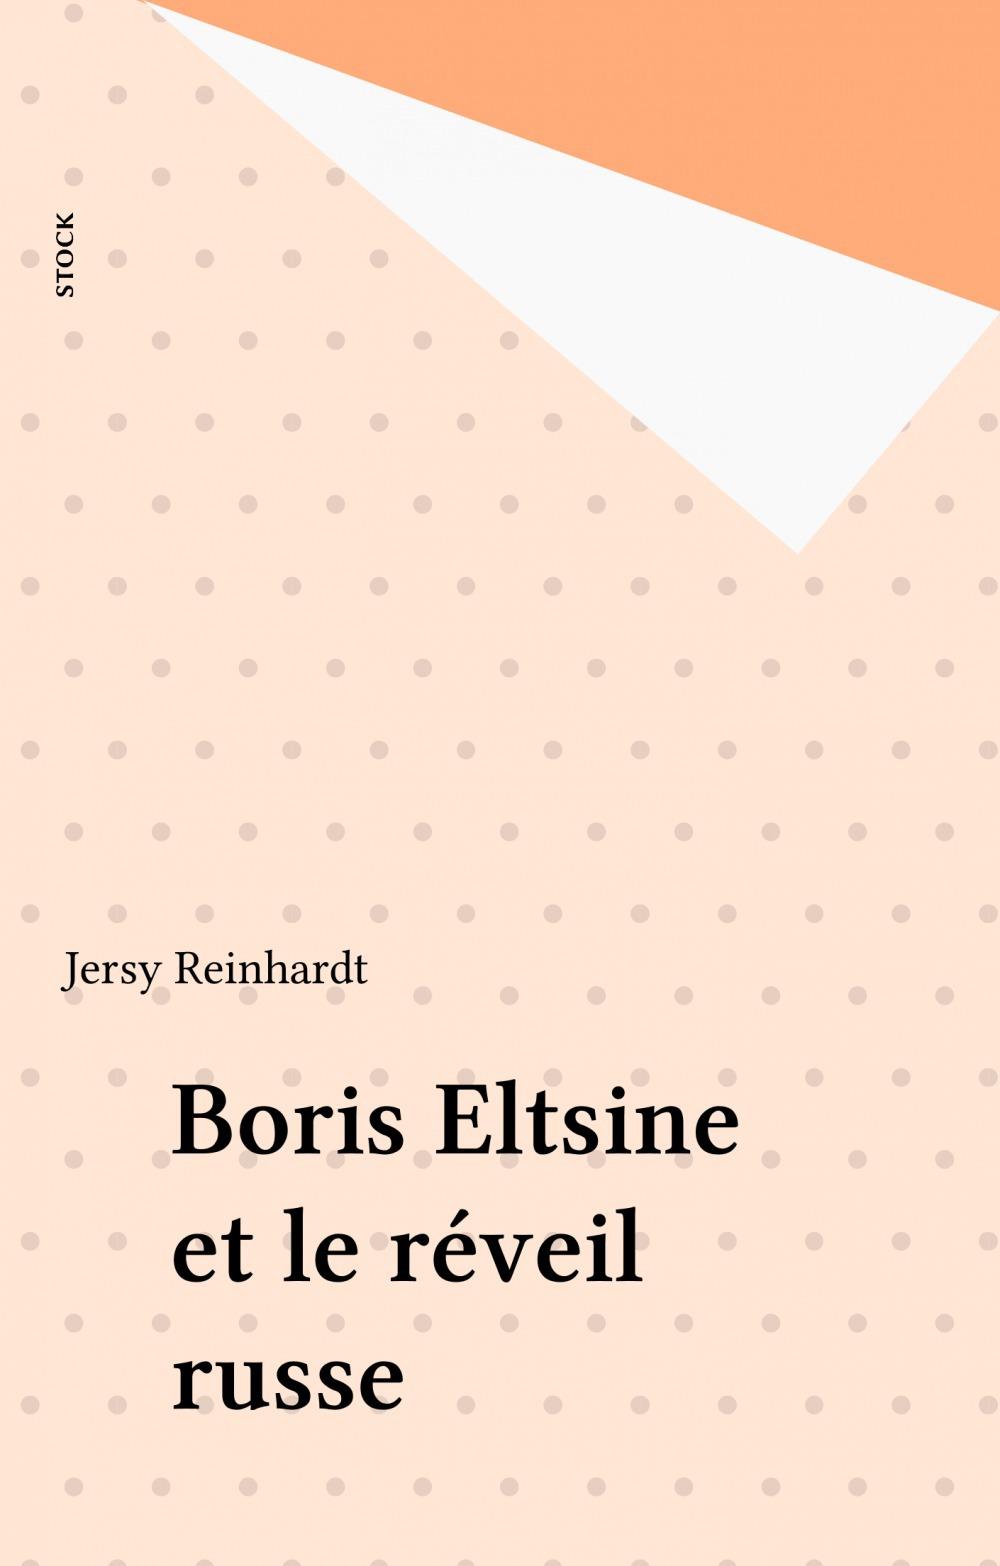 Boris eltsine et le reveil russe